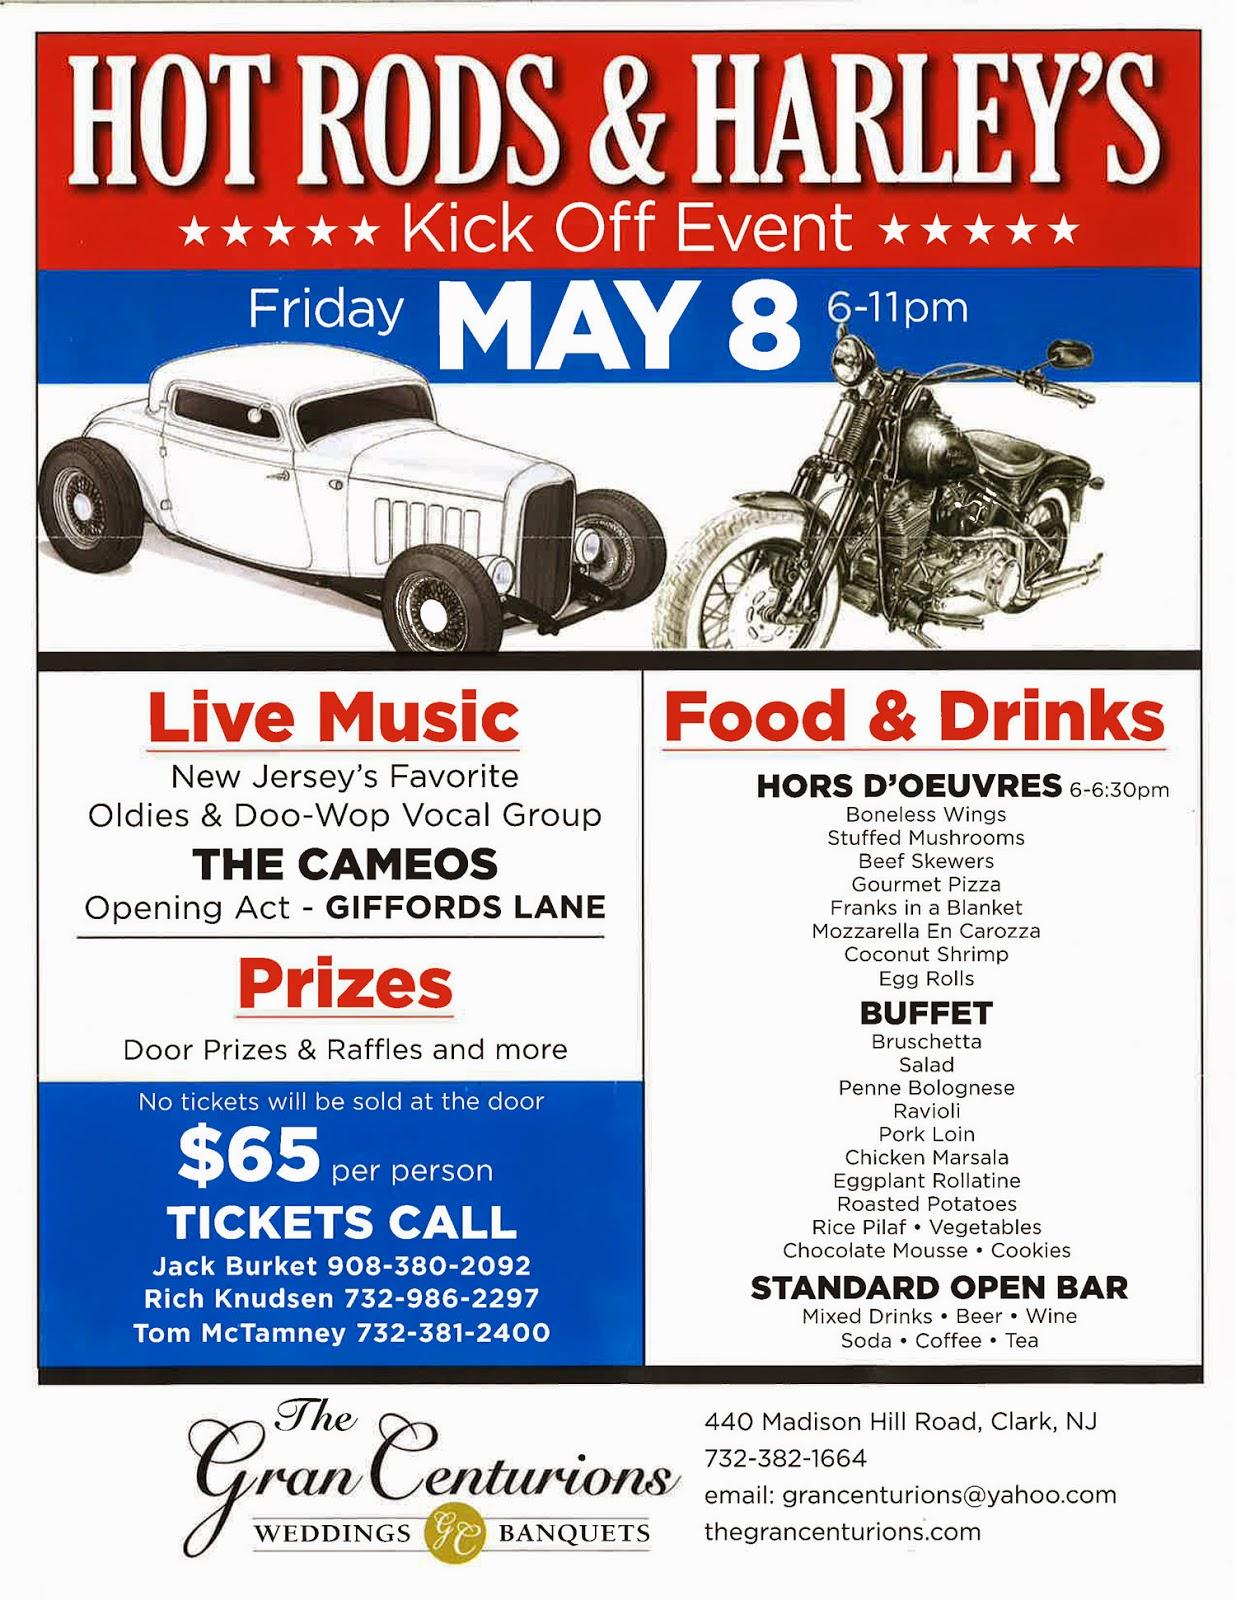 http://www.libertyharley.com/hrh/Kick off event flyer.pdf